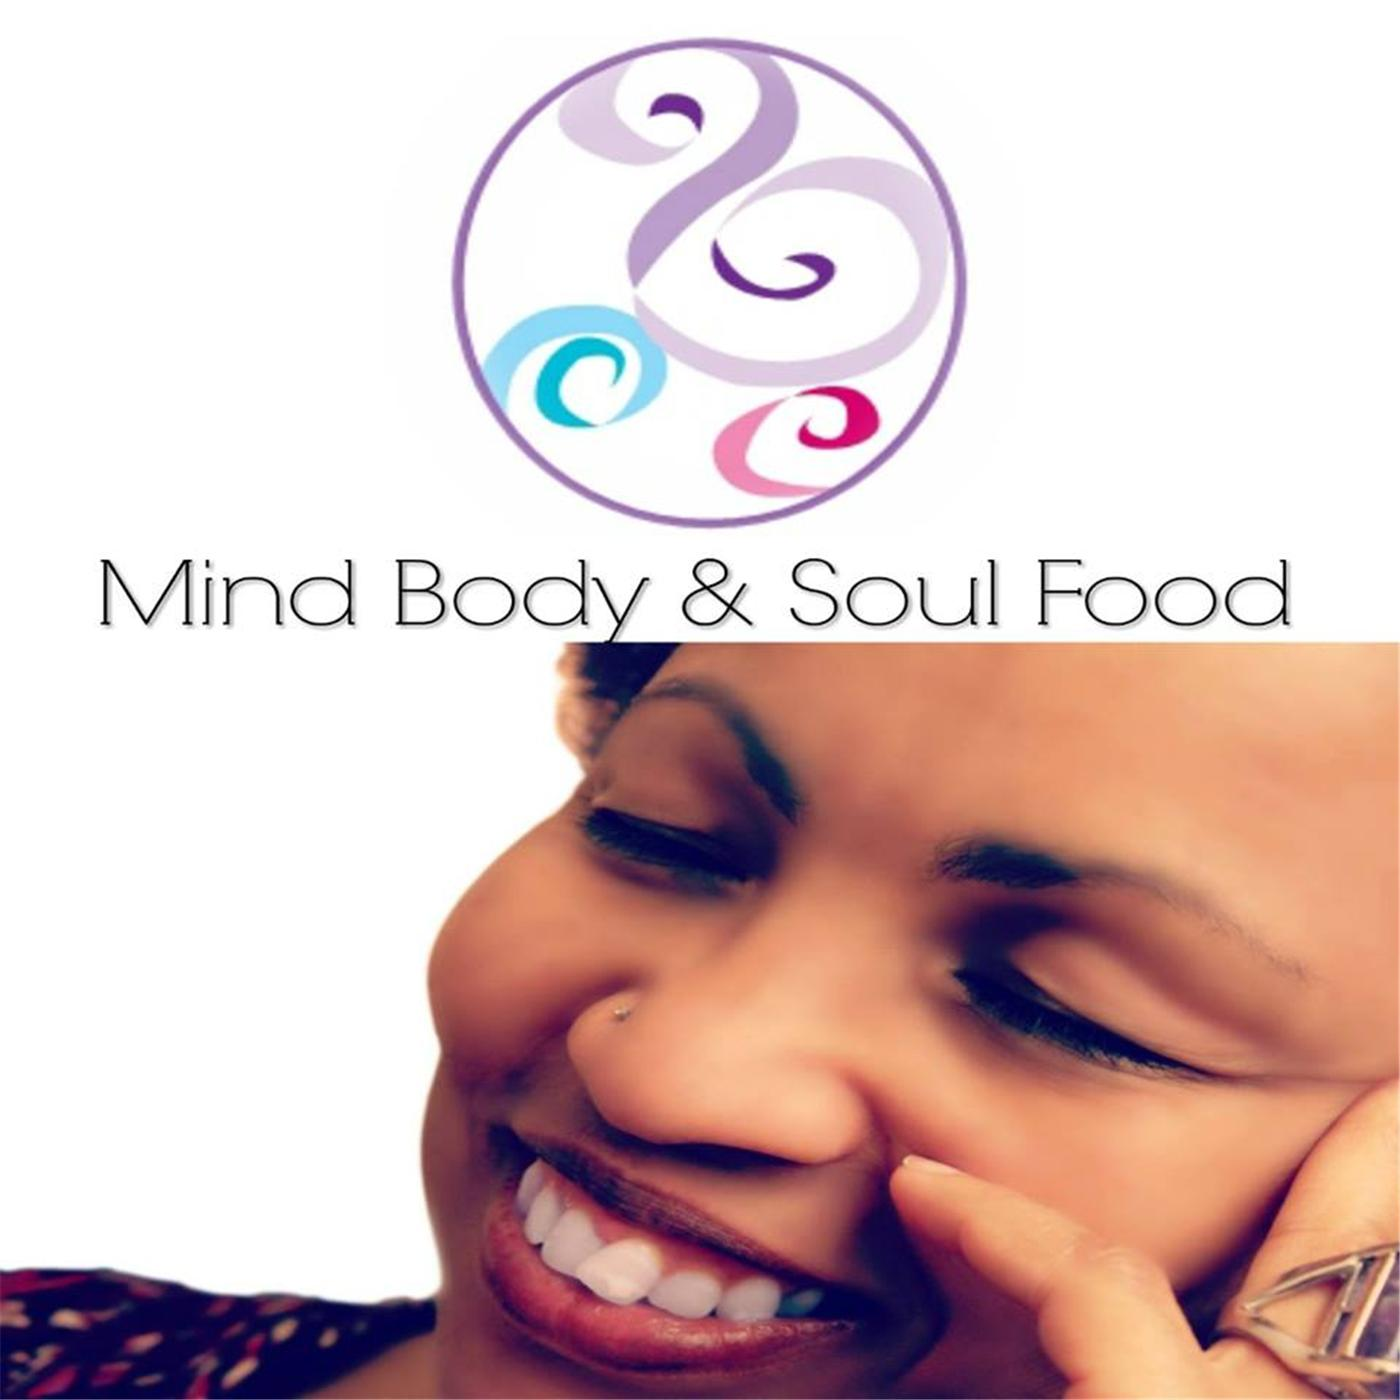 Mind, Body & Soul Food